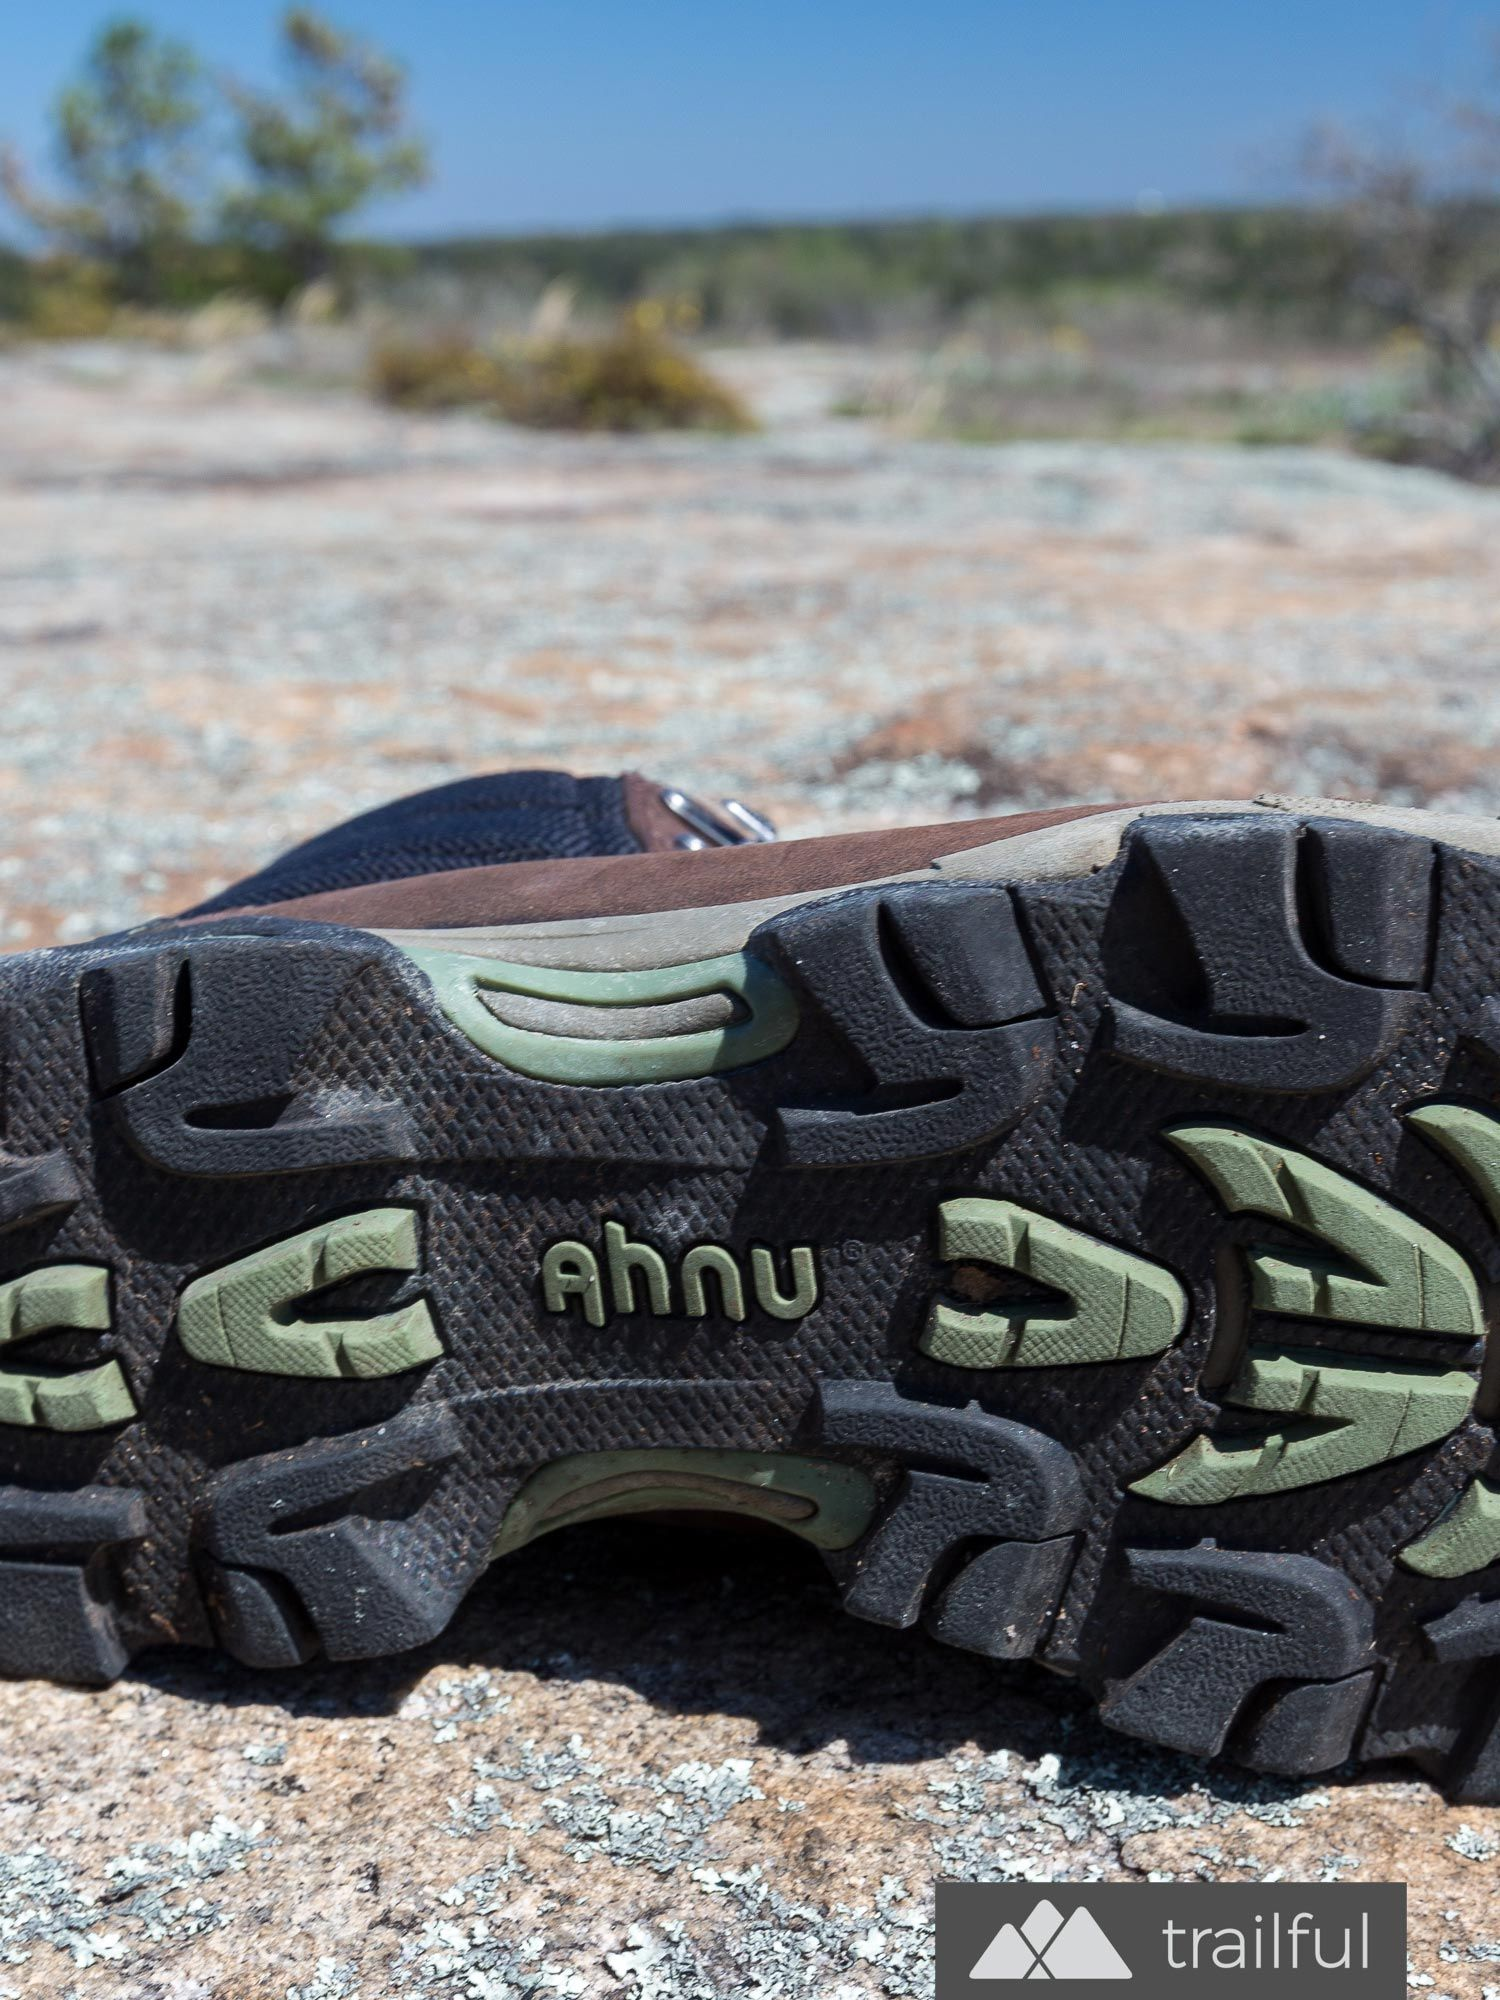 Ahnu Coburn Men S Hiking Boot Review With Images Mens Hiking Boots Hiking Boots Boots